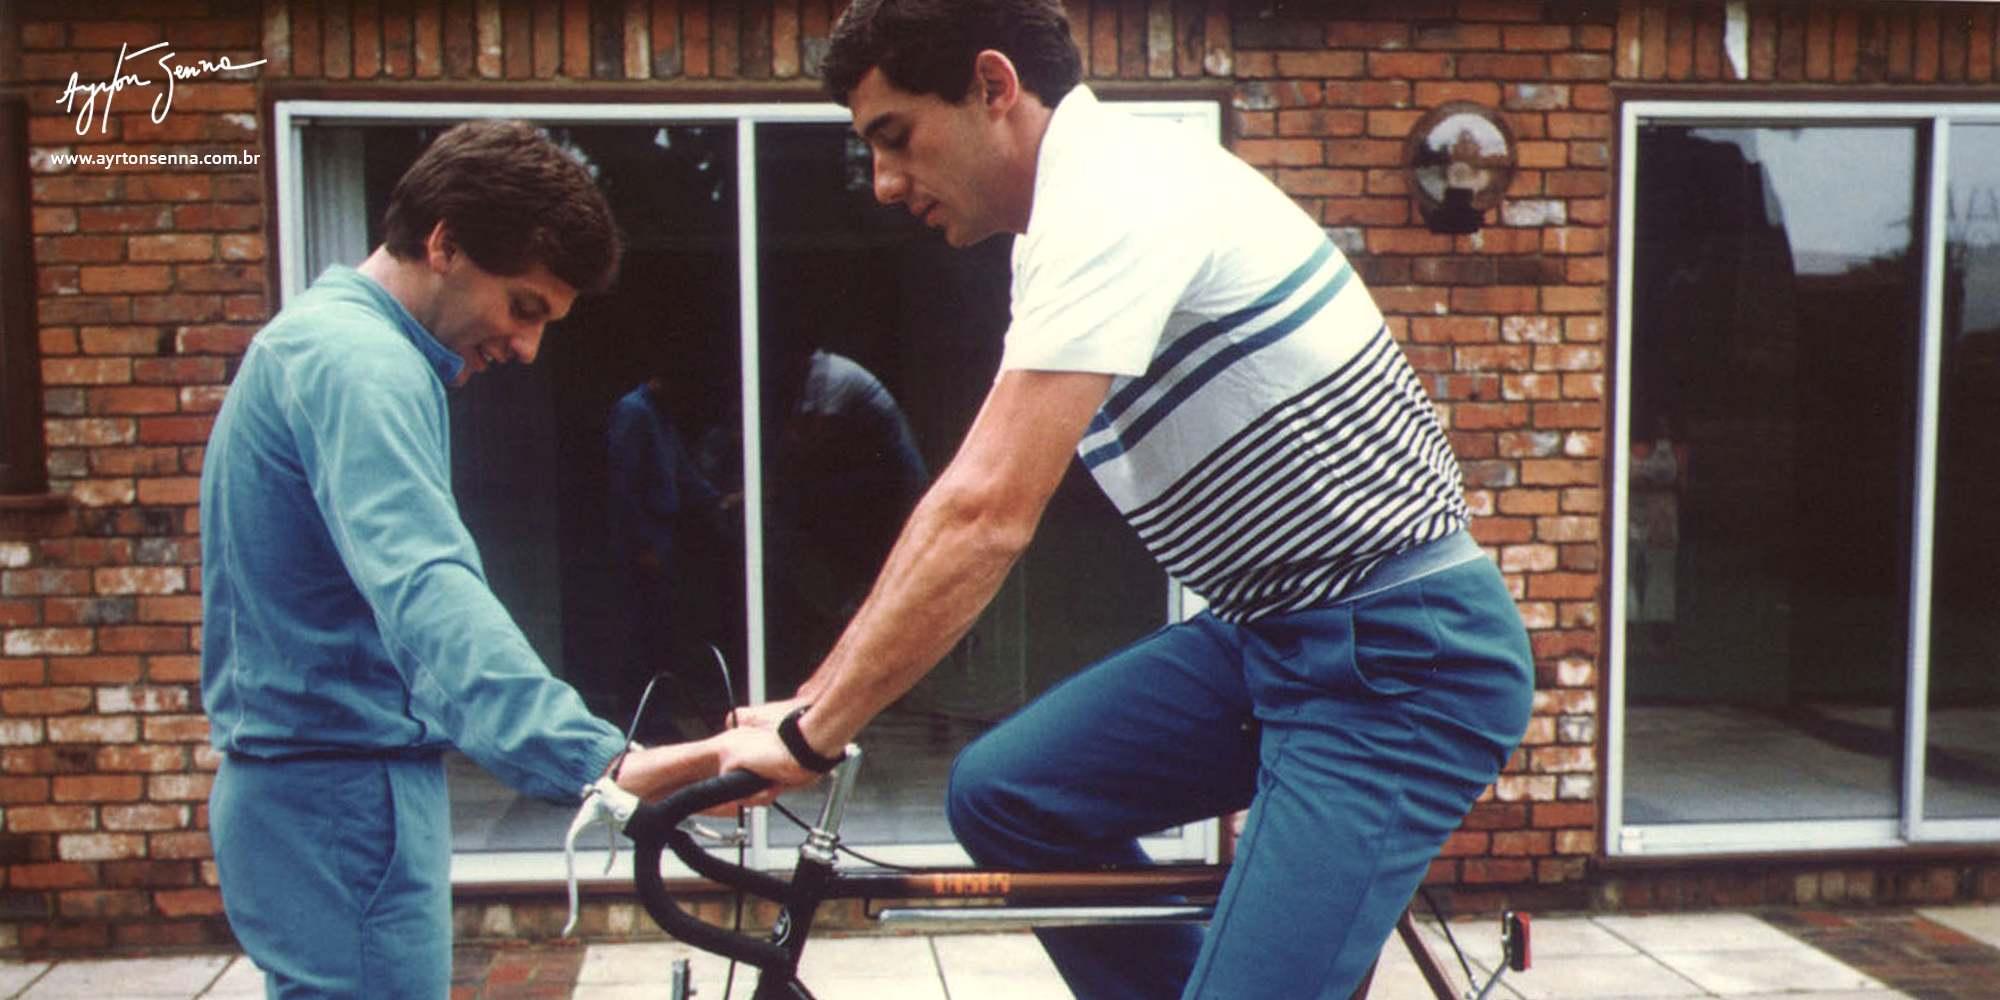 Gugelmin sobre polêmica entre Senna e Balestre: